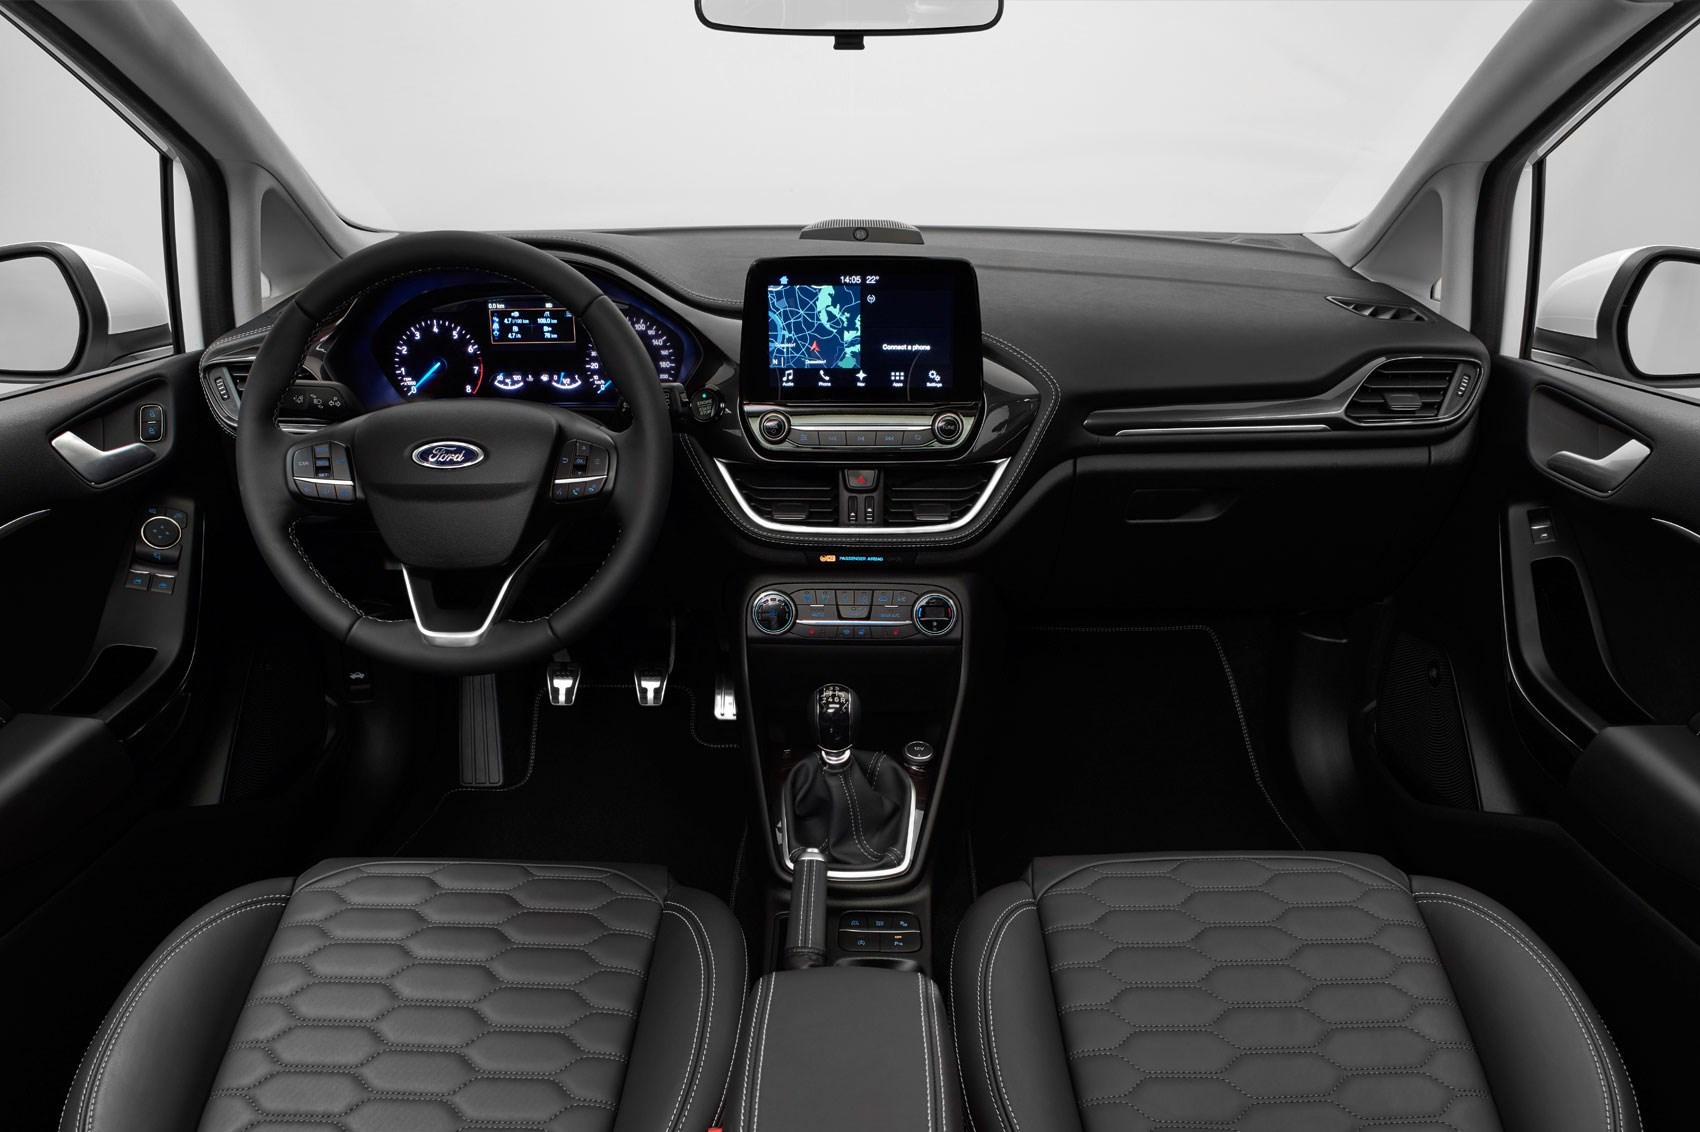 Subaru Wrx Sti 2016 Long Term Test Review Car Magazine Giant Atx Se 2 2014 S Blue Wht Gry 2017 Ford Fiesta